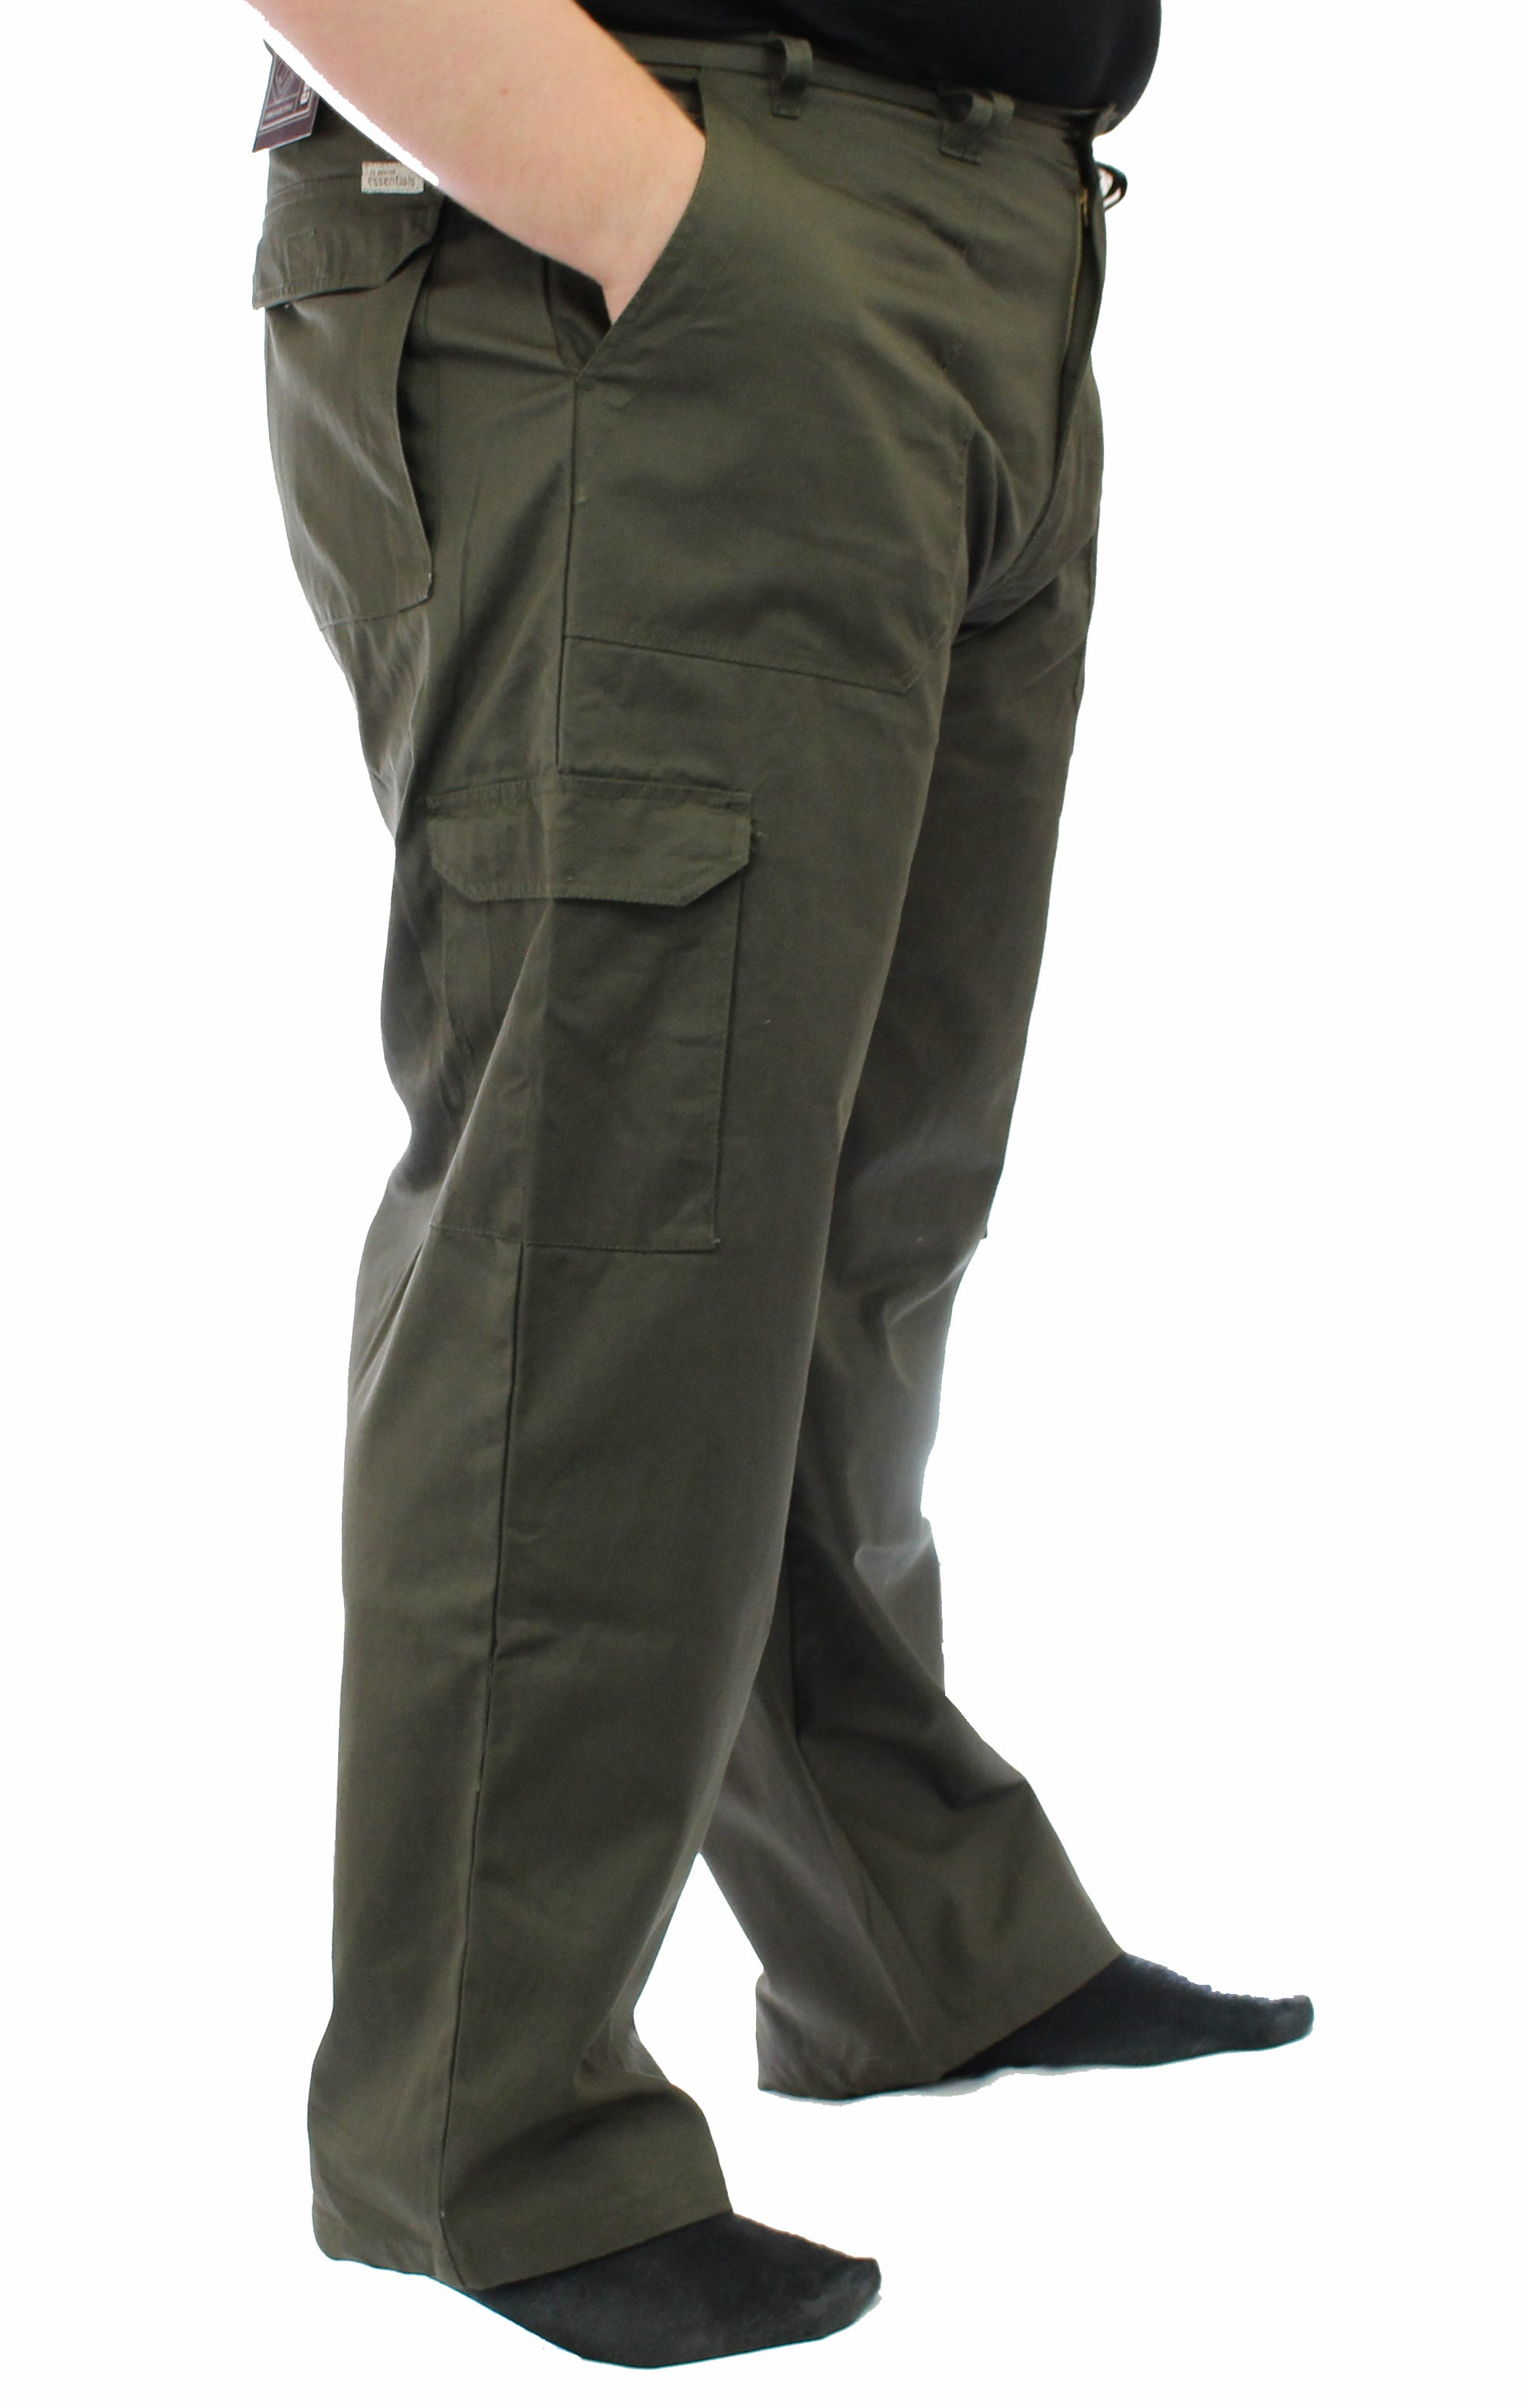 "Ed Baxter Victory - Heavy Duty Cargo Combat Trousers - Khaki - 50"" Waist, 34"" Leg"